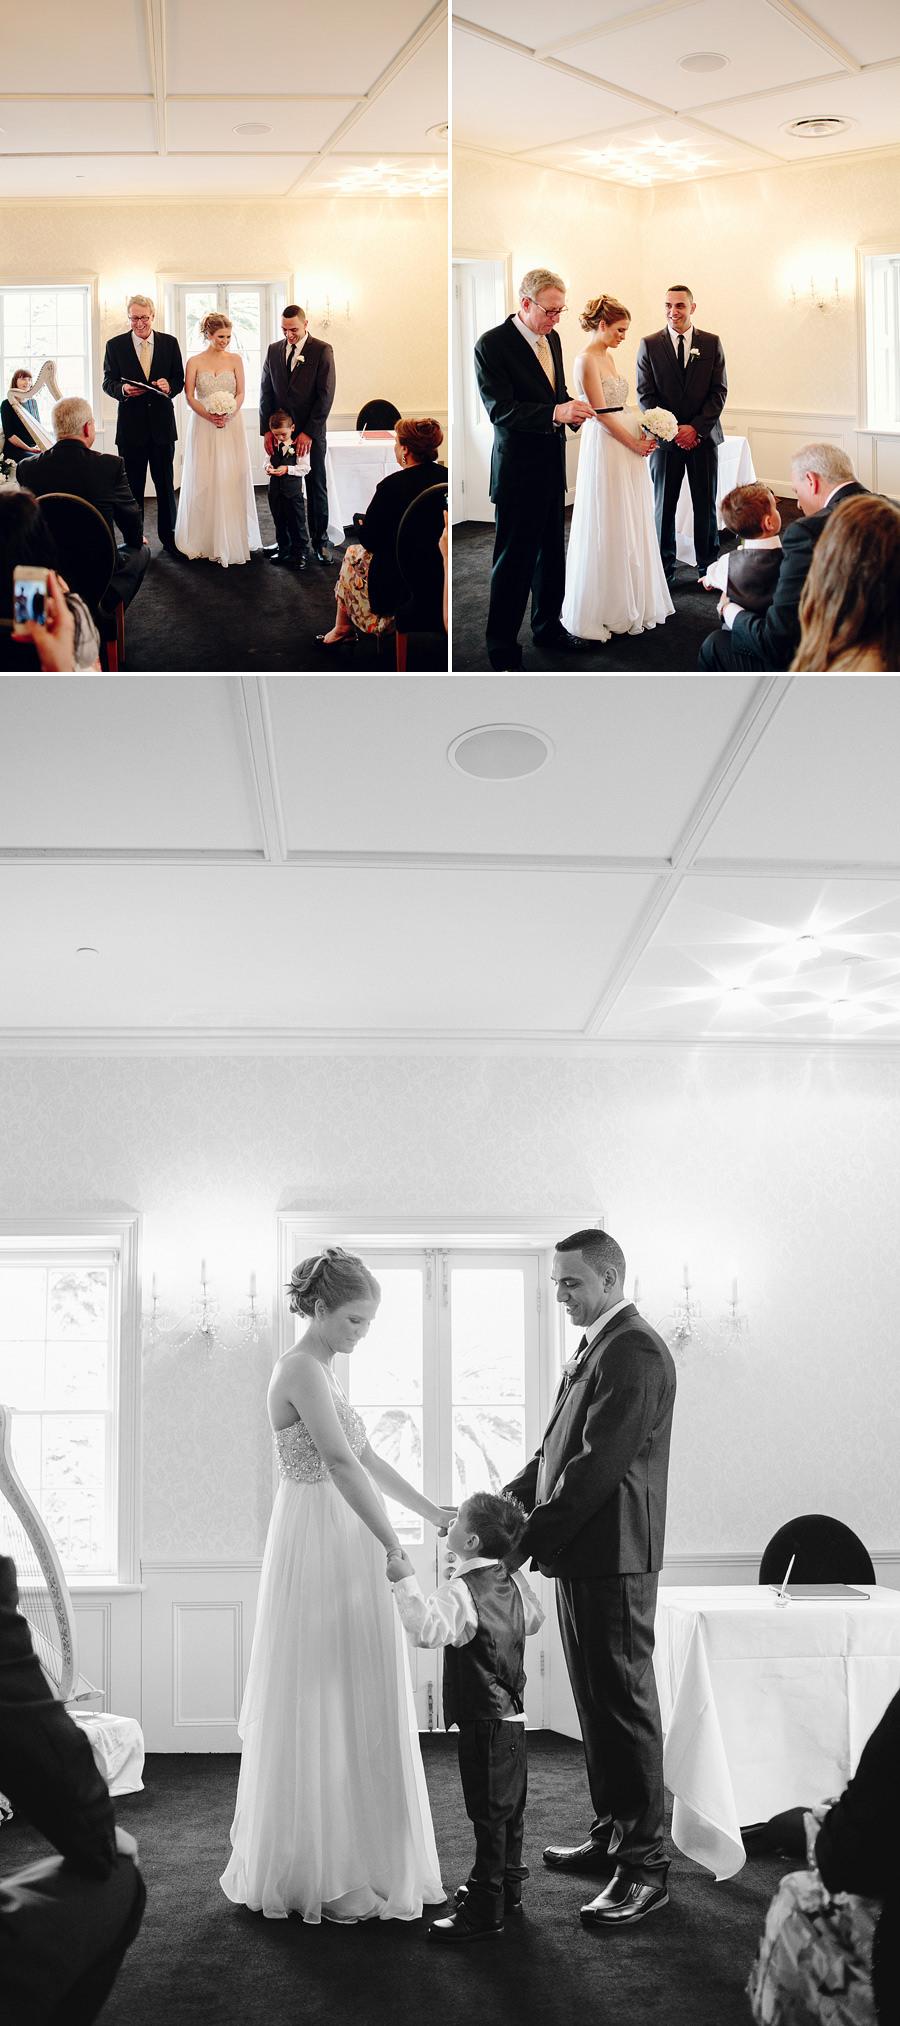 Vaucluse Wedding Photographer: Ceremony